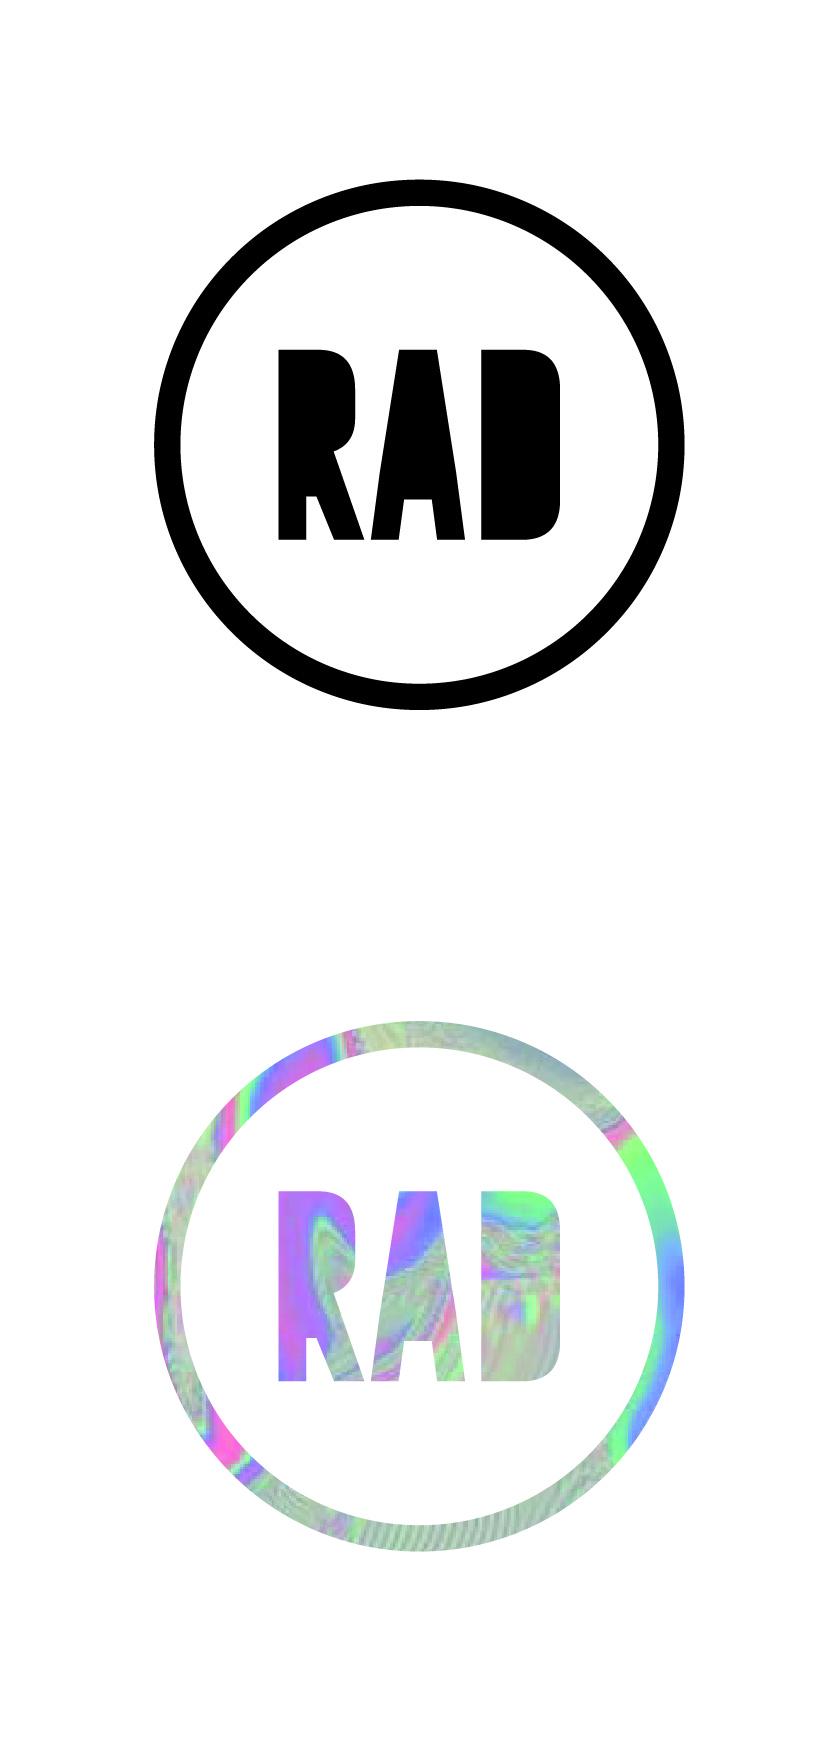 Rad-02.jpg